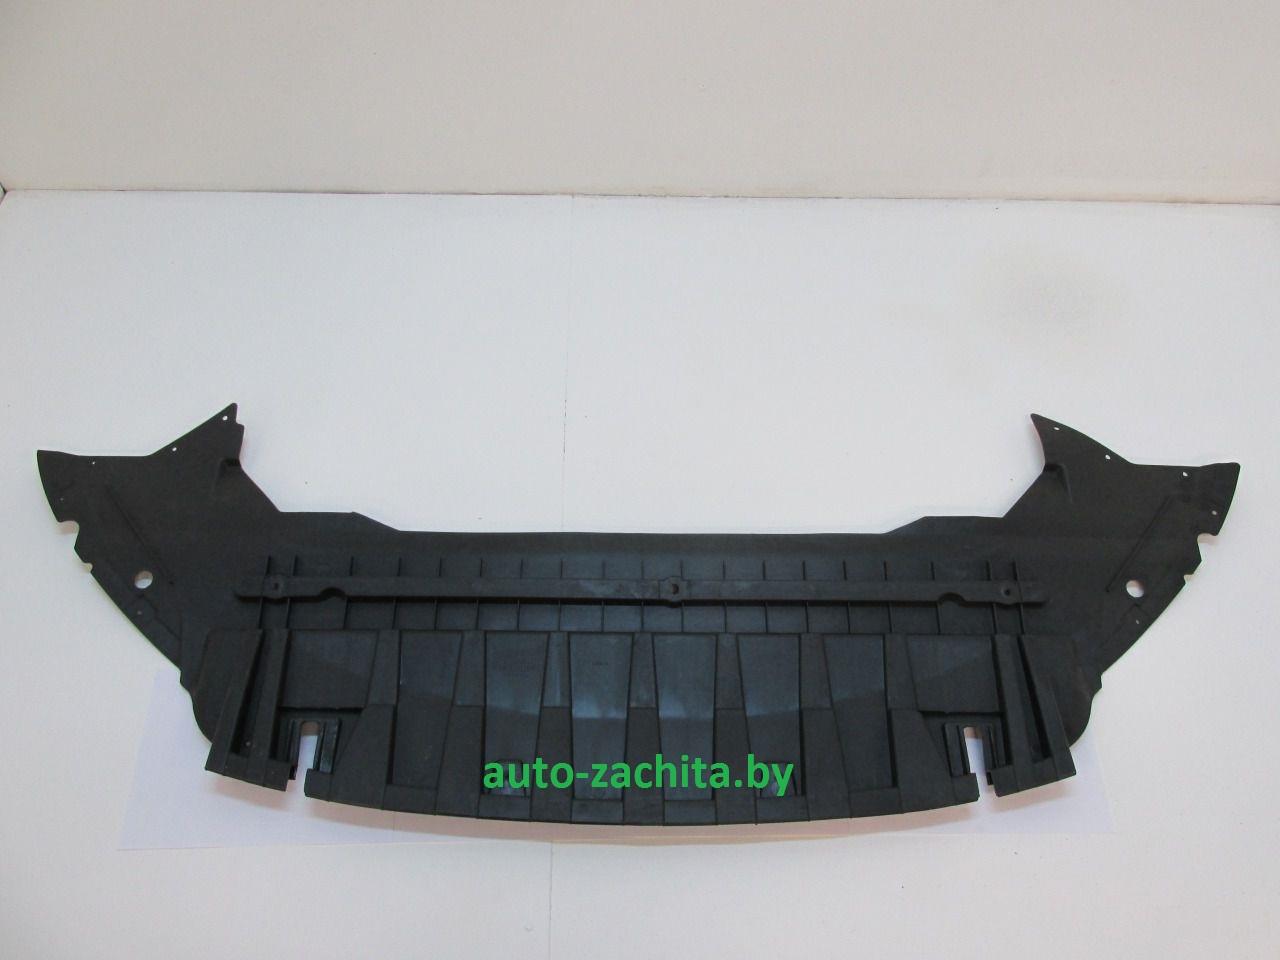 Юбка на задний бампер форд мондео 4 22 фотография